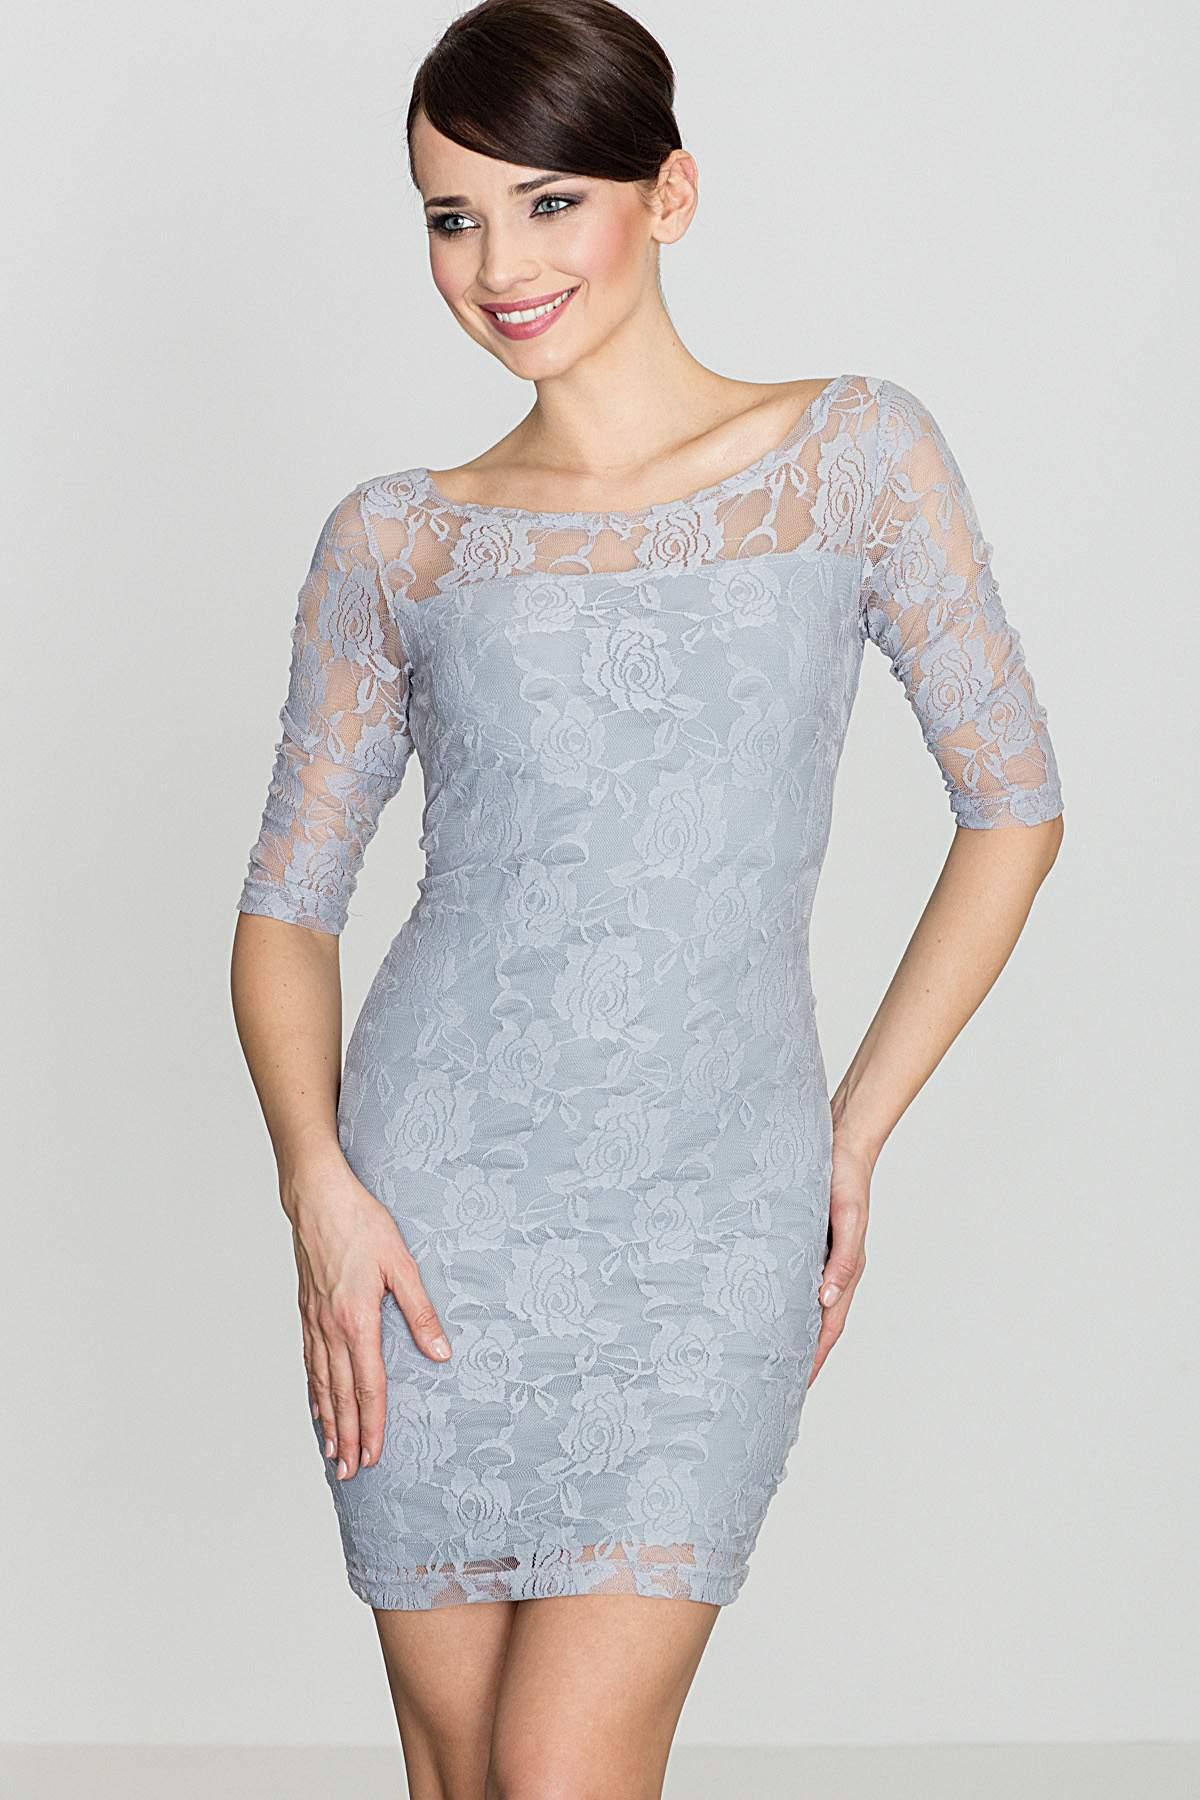 KATRUS Θηλυκο φορεμα δαντελα